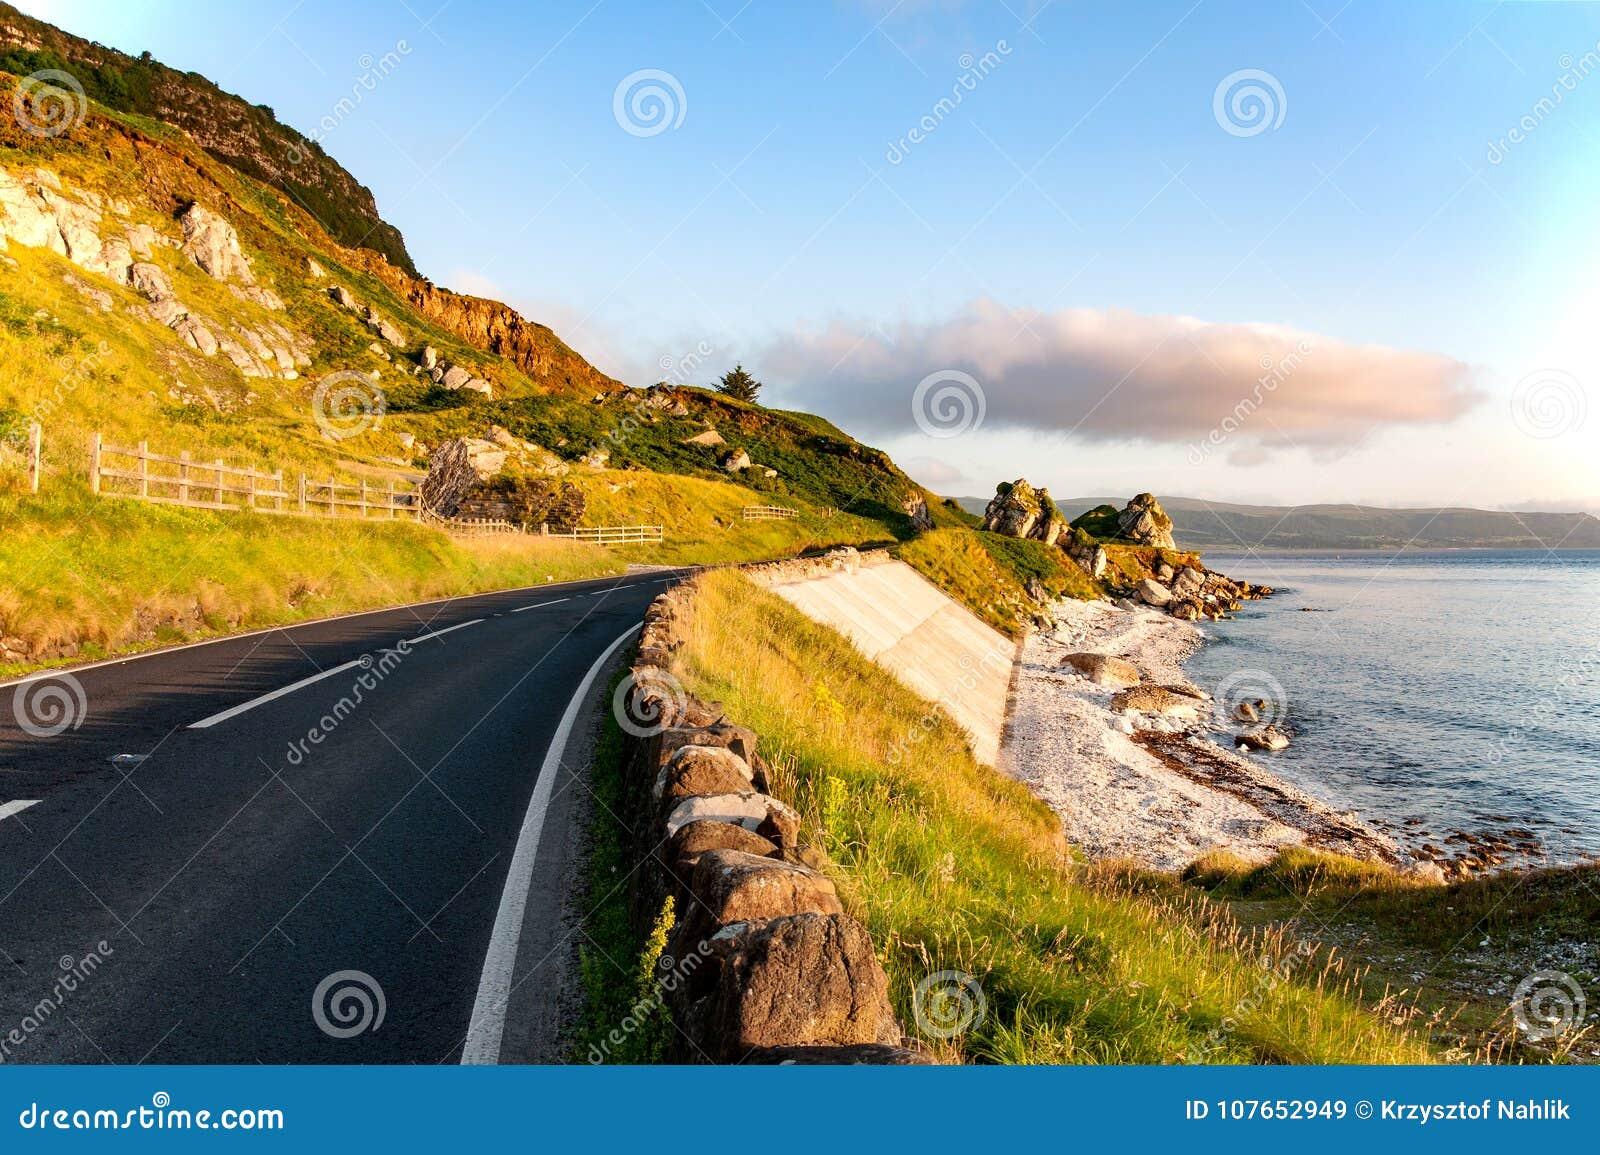 Antrim Coastal Road in Northern Ireland, UK